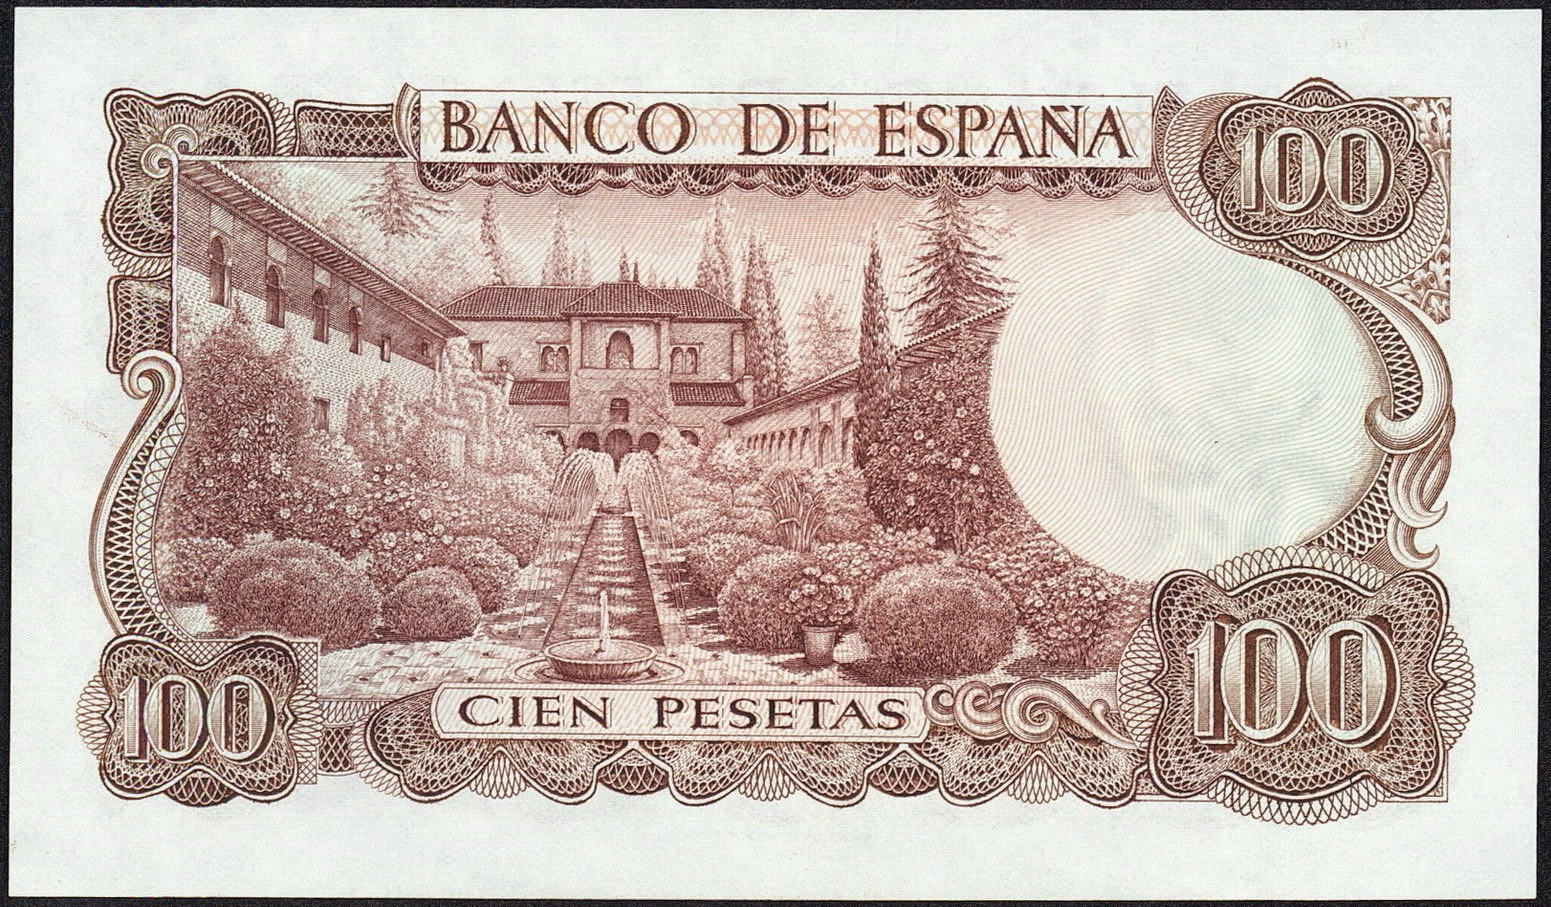 Spain money currency 100 Pesetas banknote 1970 Court of la Acequia, Palacio de Generalife